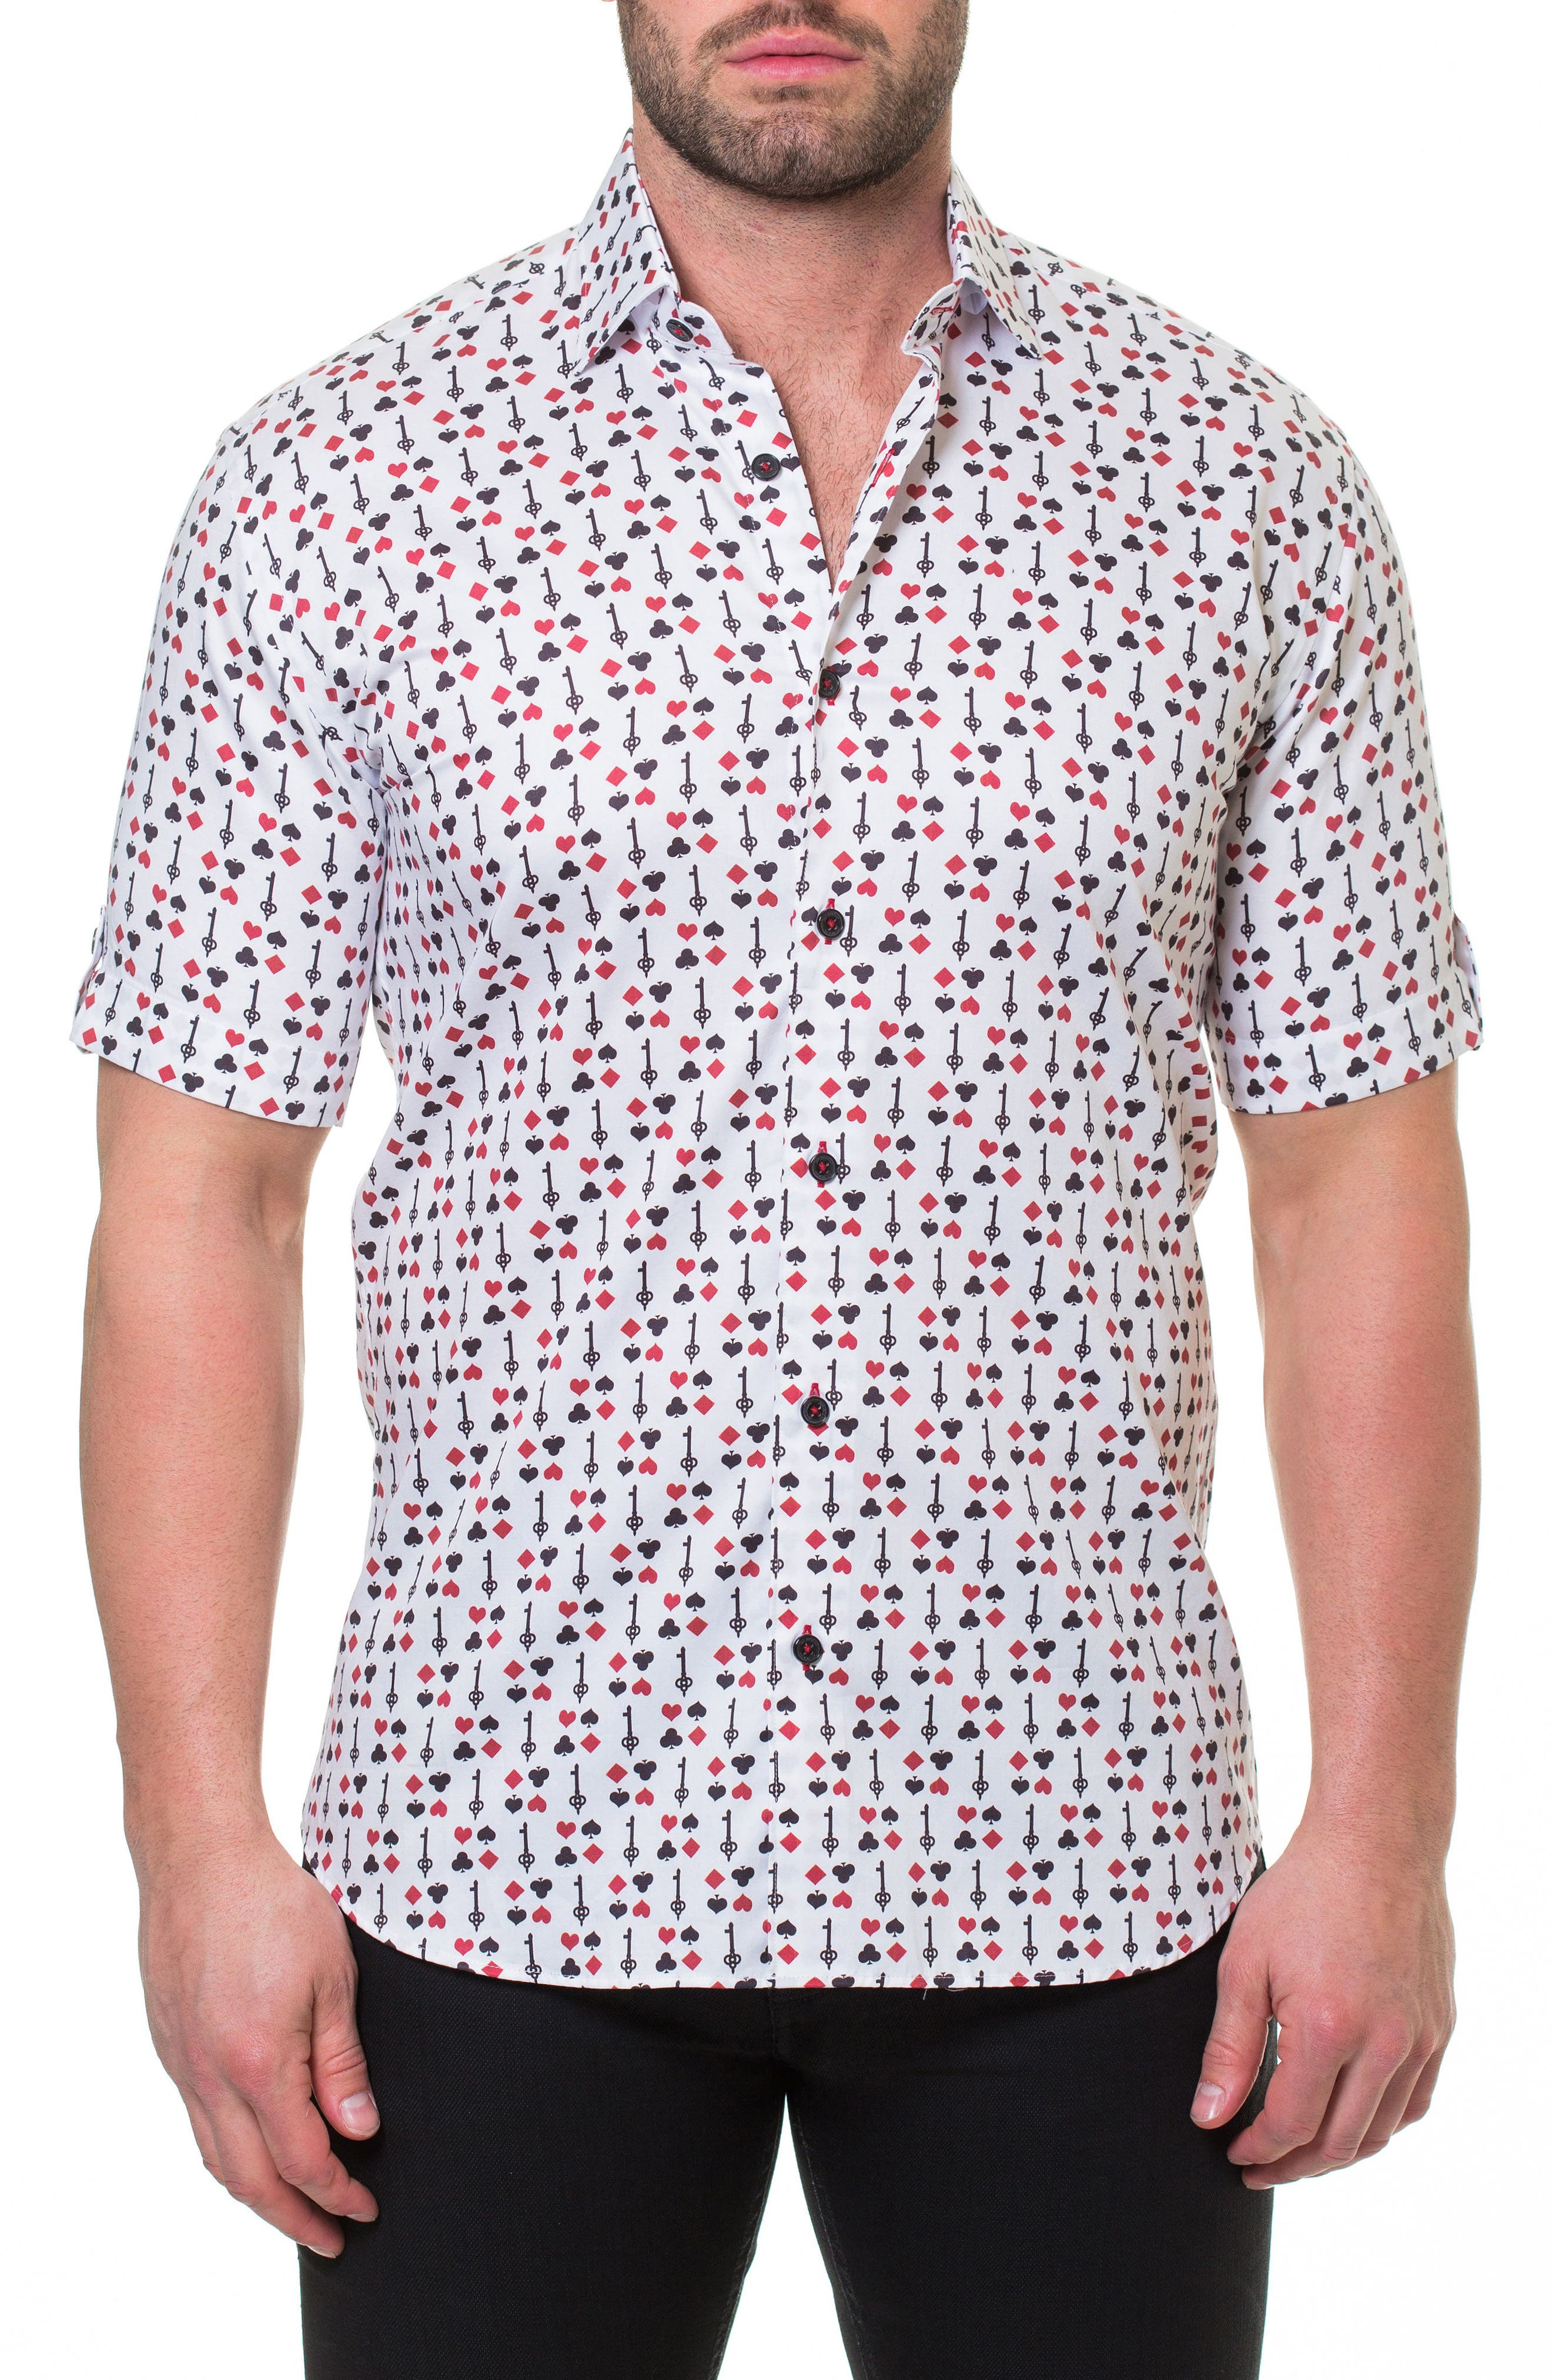 Maceoo Fresh BlackJack Slim Fit Sport Shirt